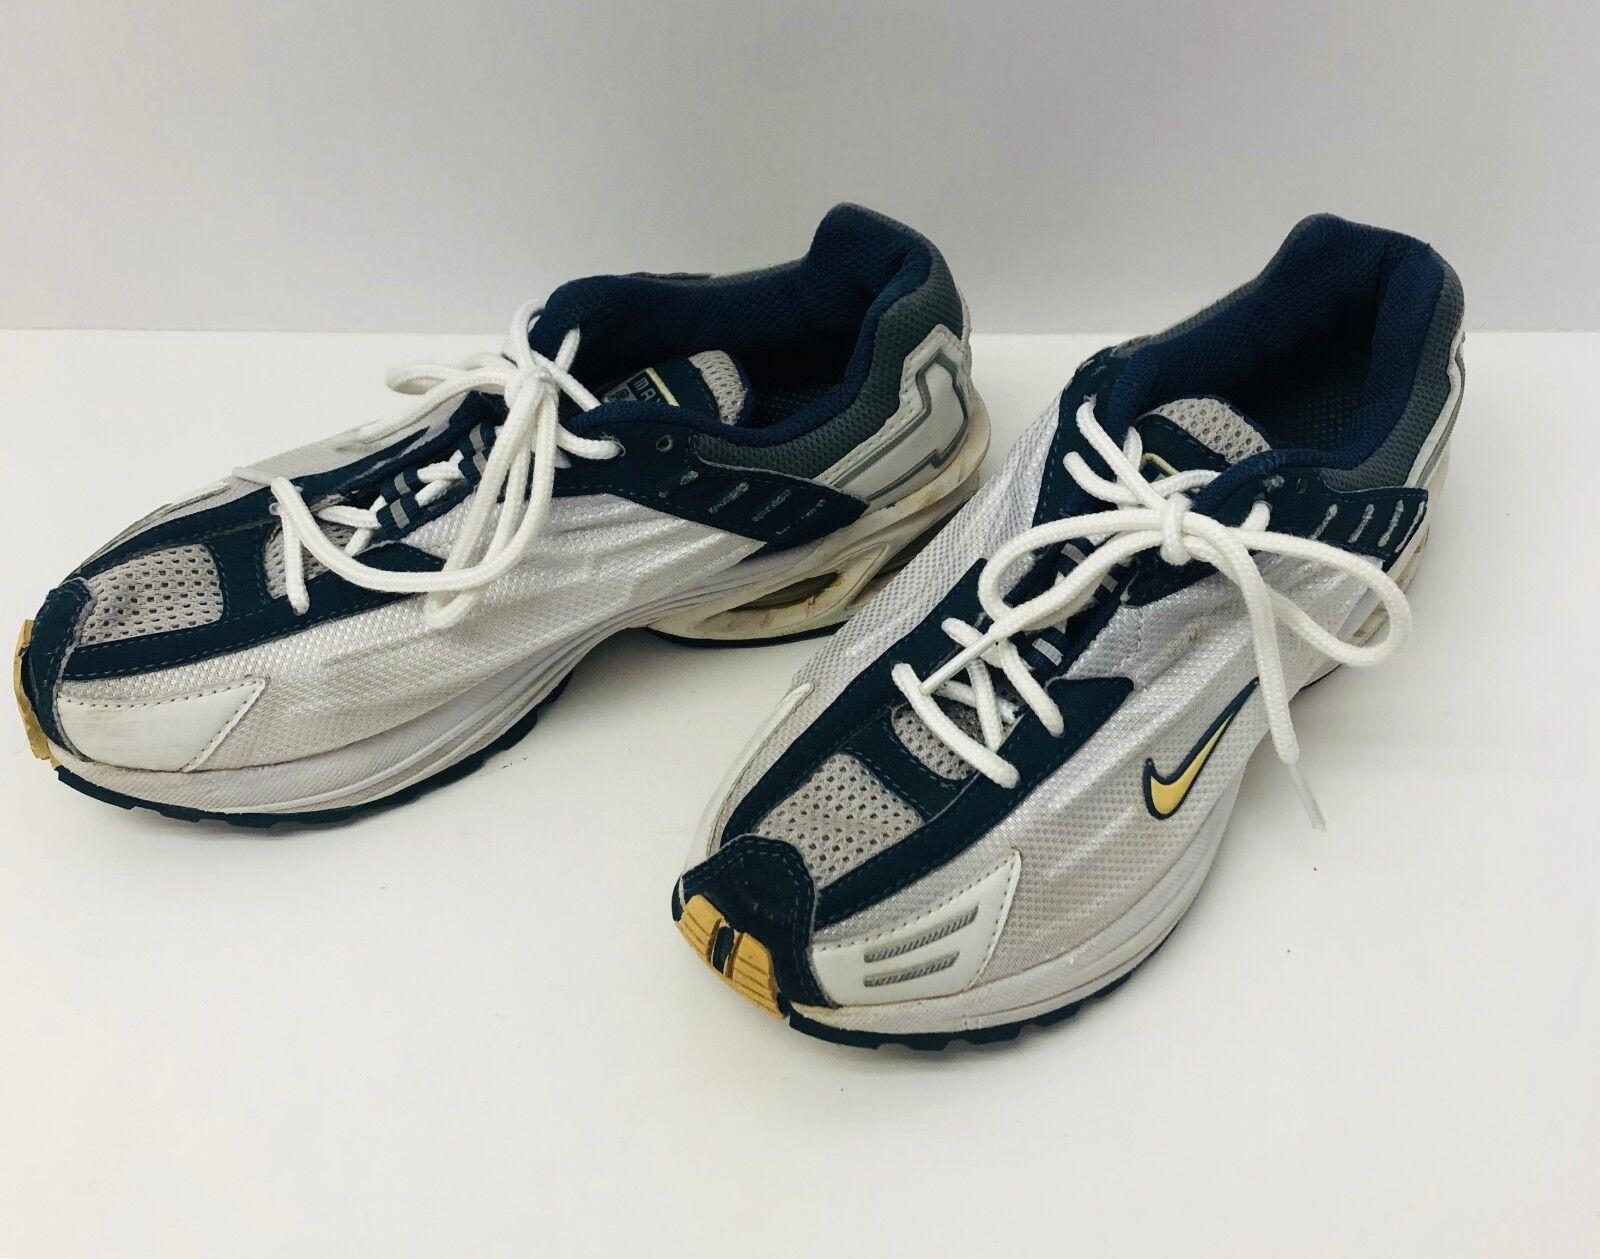 nike max aria triax 94 signore scarpe bianco blu blu blu navy correndo scorpe 7 | Fine Anno Vendita Speciale  | riduzione del prezzo  | Queensland  | Maschio/Ragazze Scarpa  | Scolaro/Ragazze Scarpa  | Scolaro/Ragazze Scarpa  0f7acf